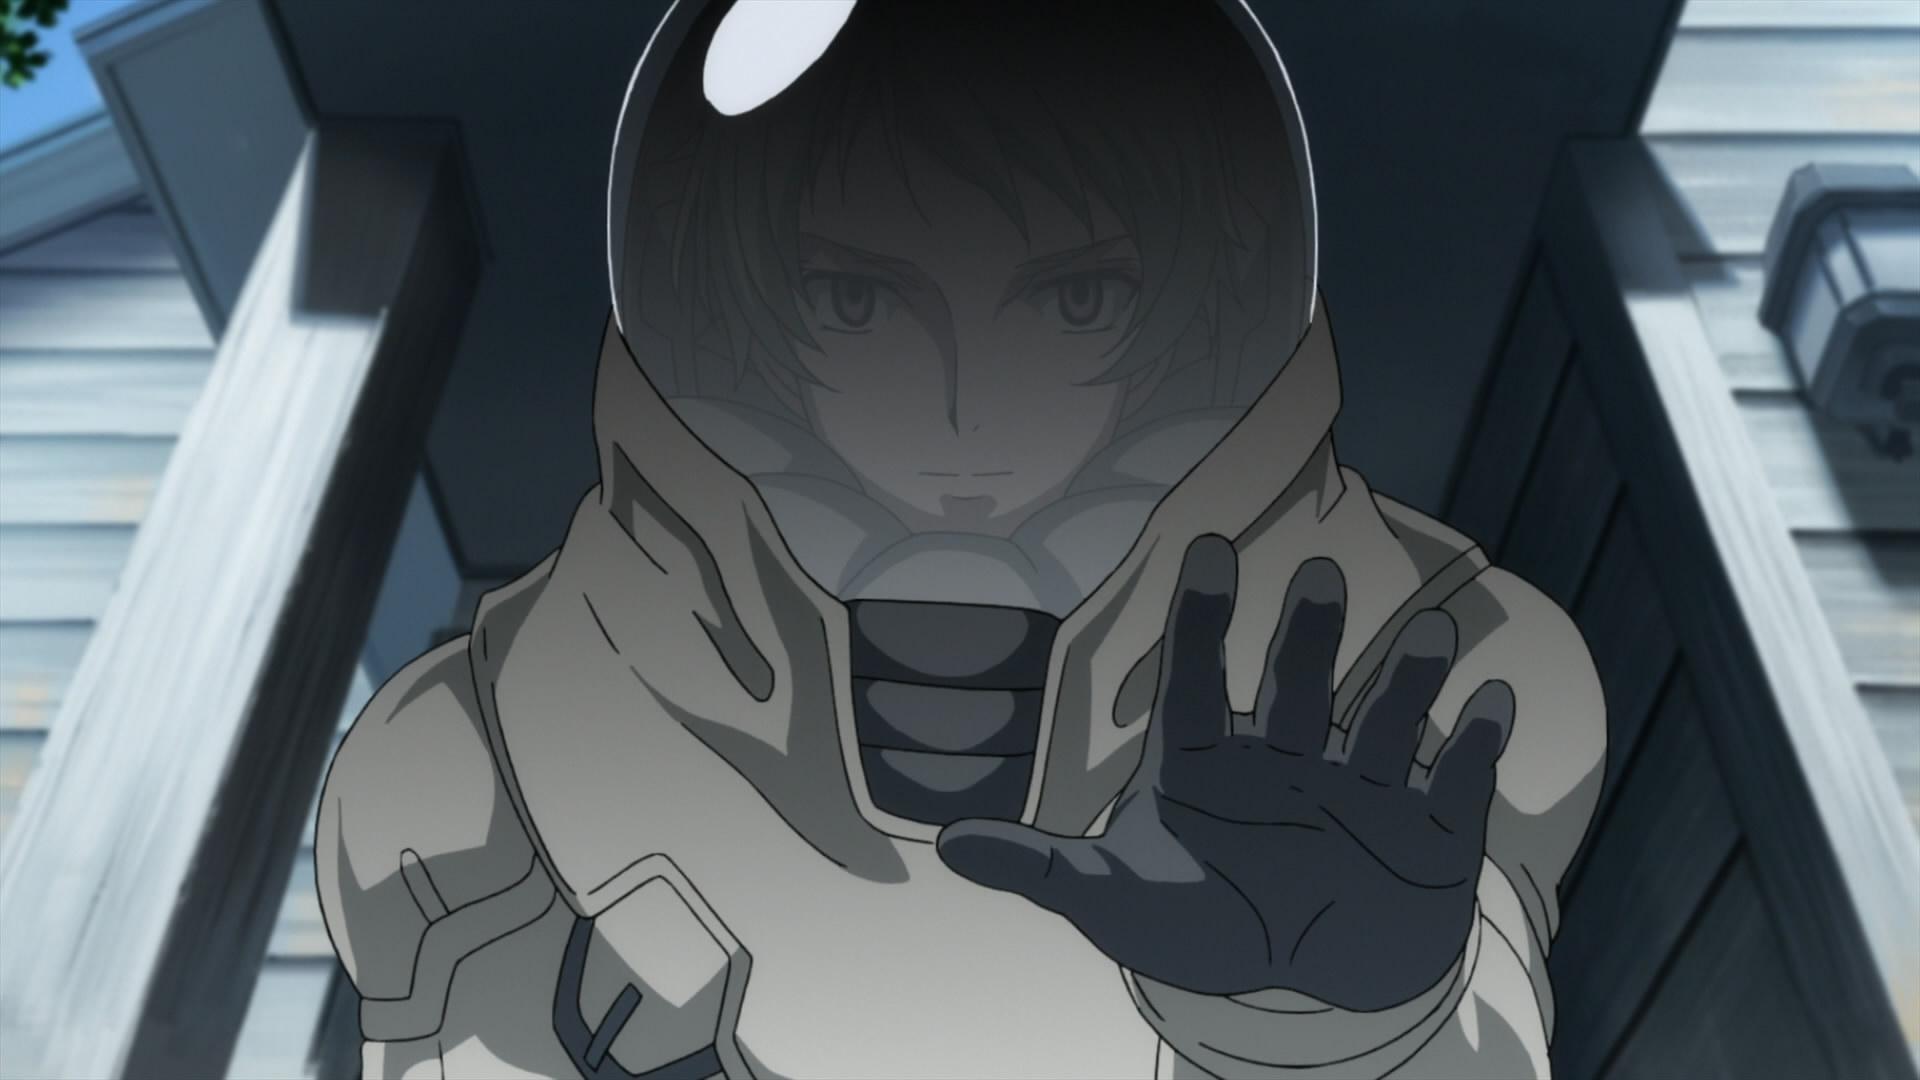 [gSS]_Mobile_Suit_Gundam_00_-_A_wakening_of_the_Trailblazer_(1080p)_[2B252856].mkv_snapshot_00.29.24_[2011.01.07_04.18.54]